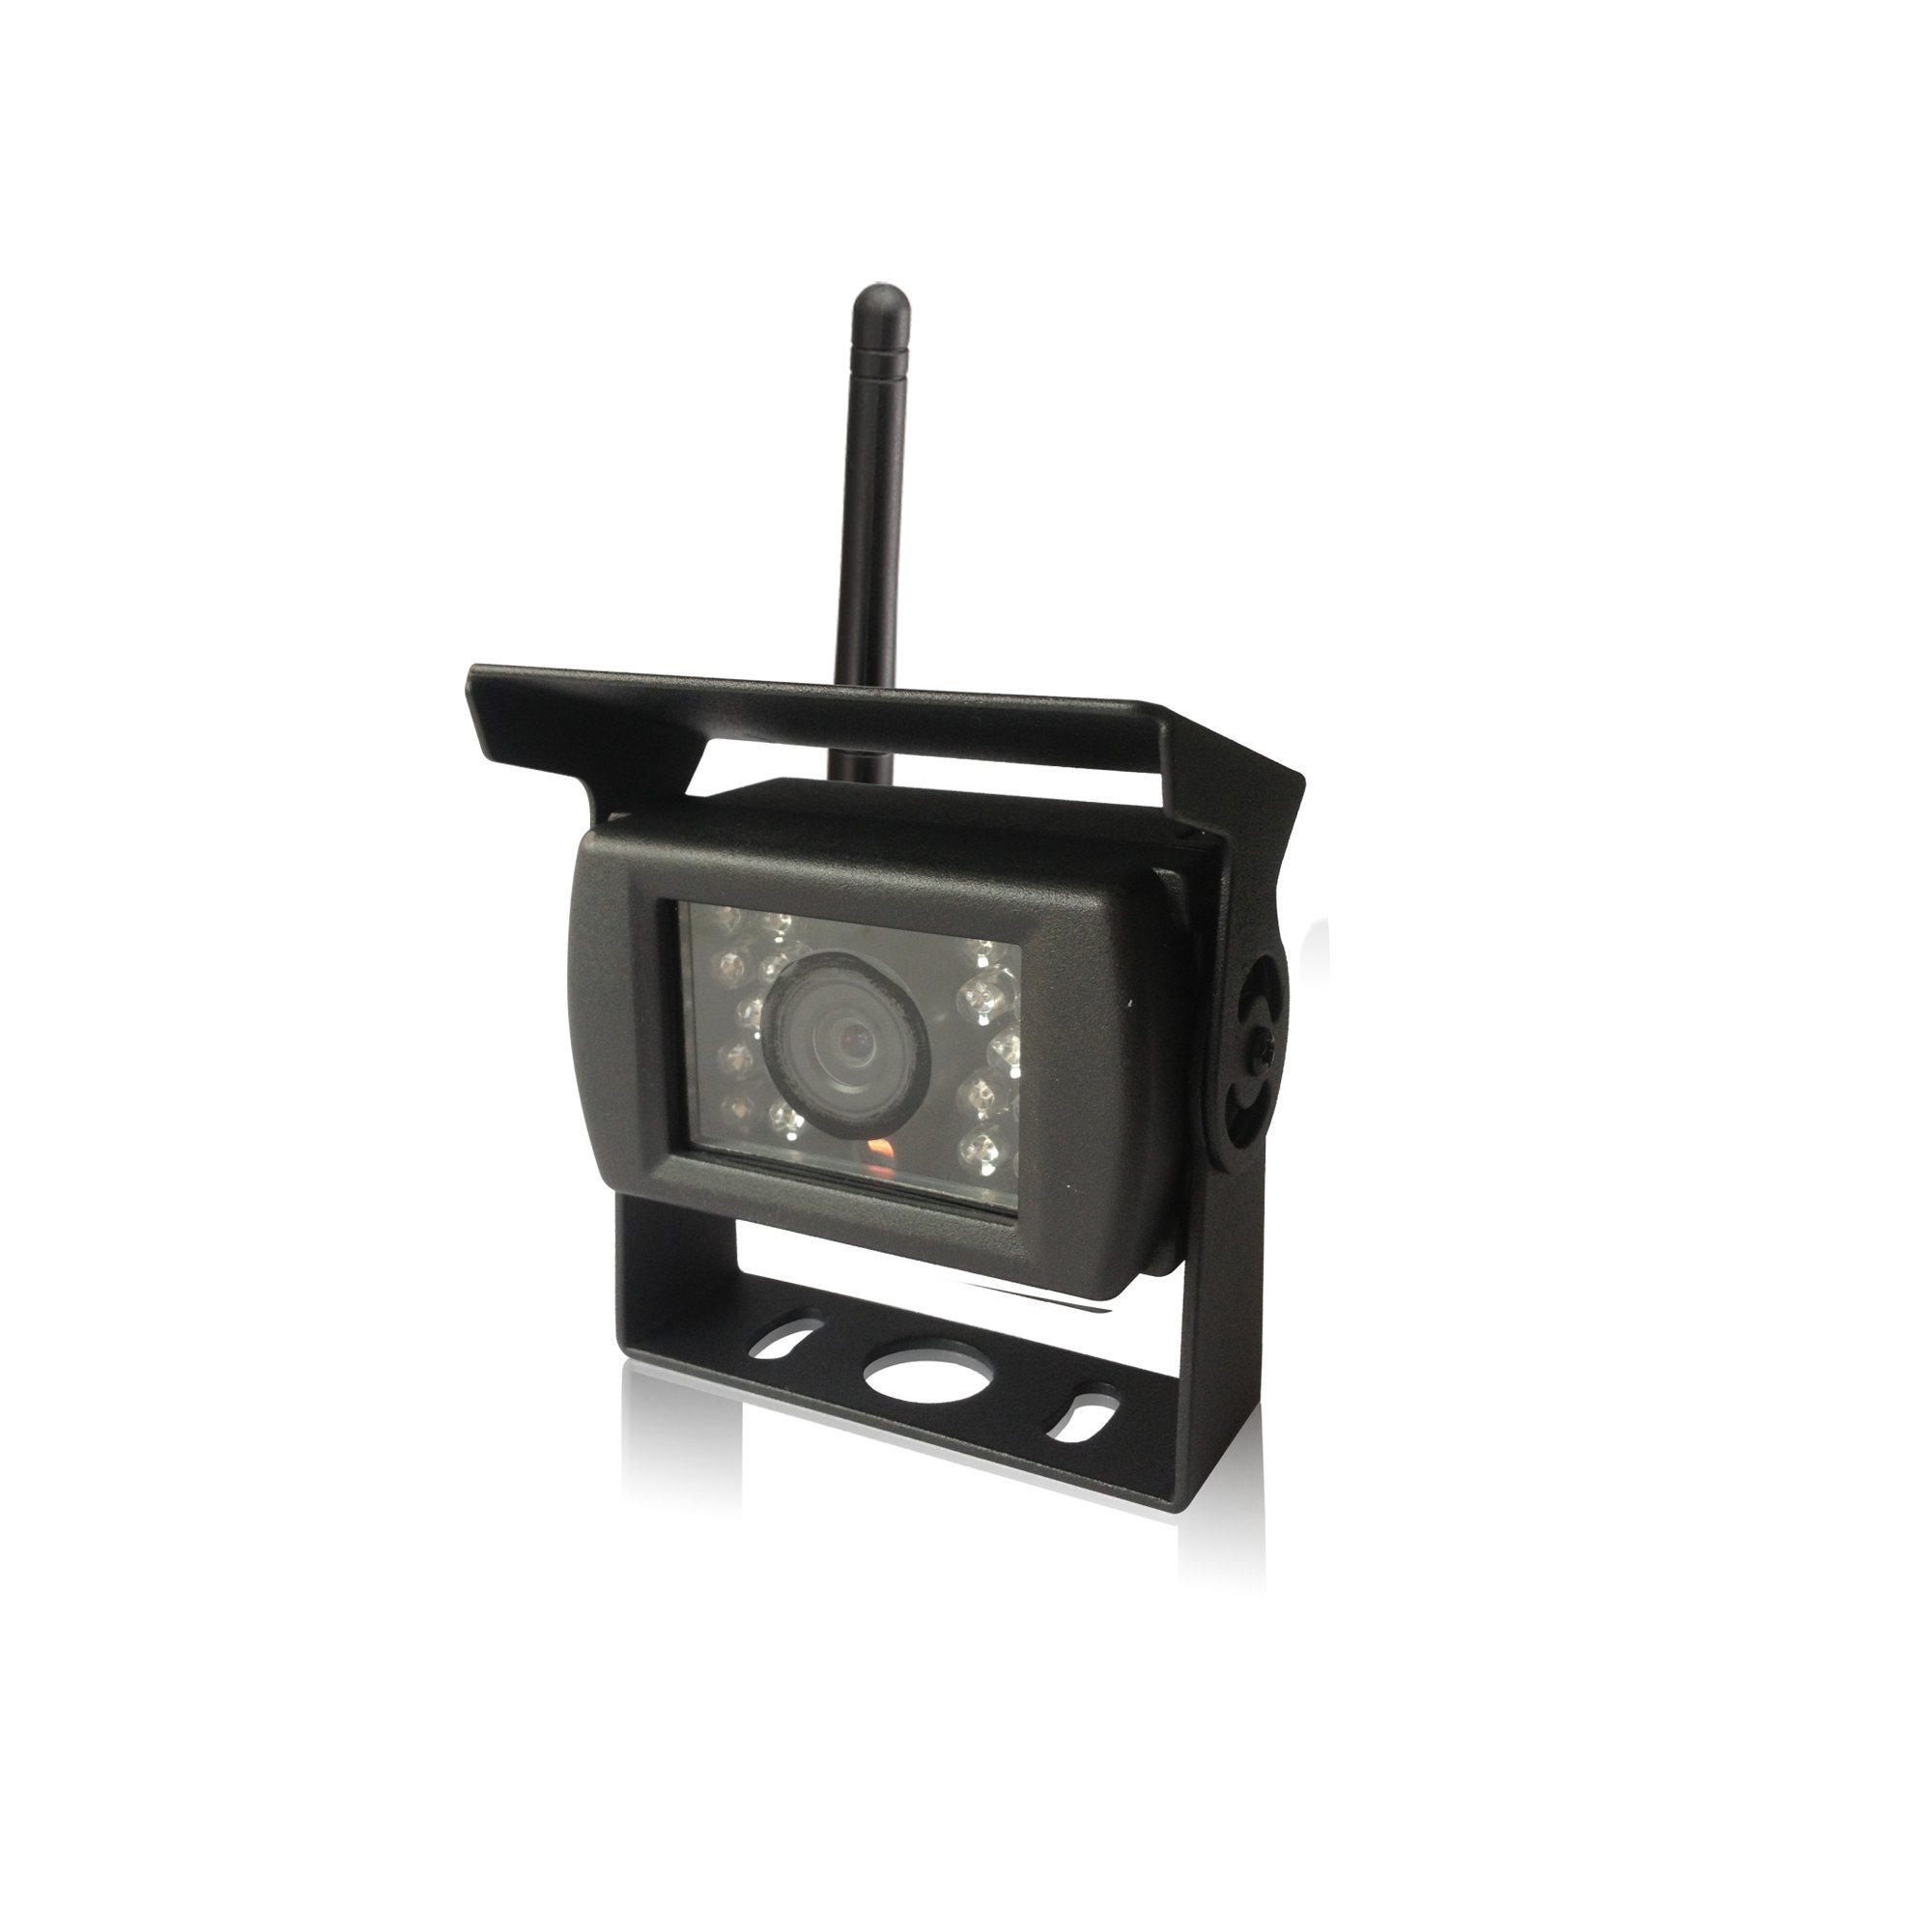 7-Inch 4CH Digital Recording Monitor Wireless Rear View Camera for Trucks, Farm Tractor, Cultivator, Trailer, Buses